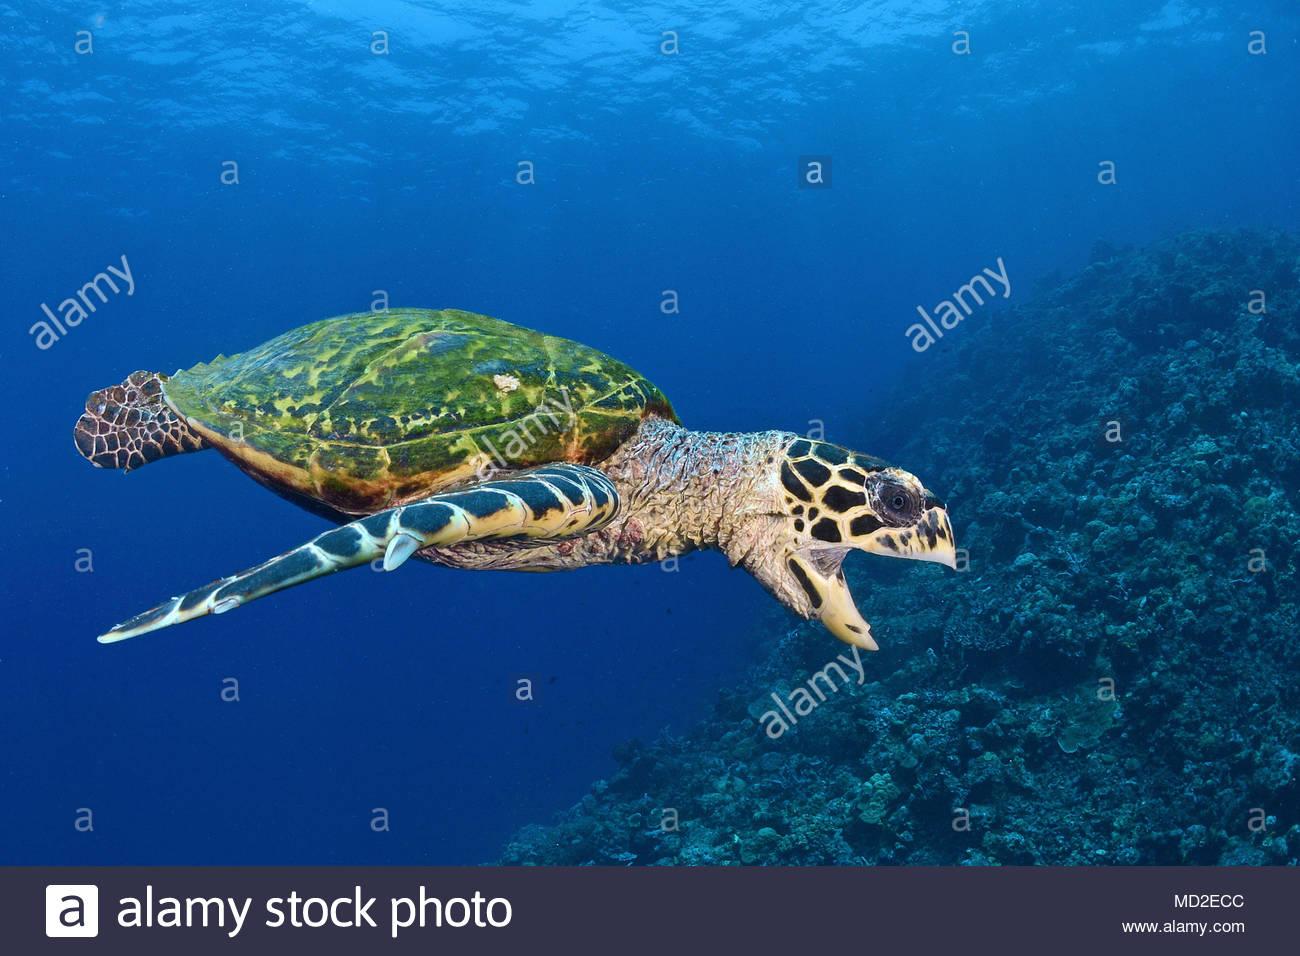 Green sea turtle (Chelonia mydas) in blue water, Ari Atoll, Maldives islands - Stock Image